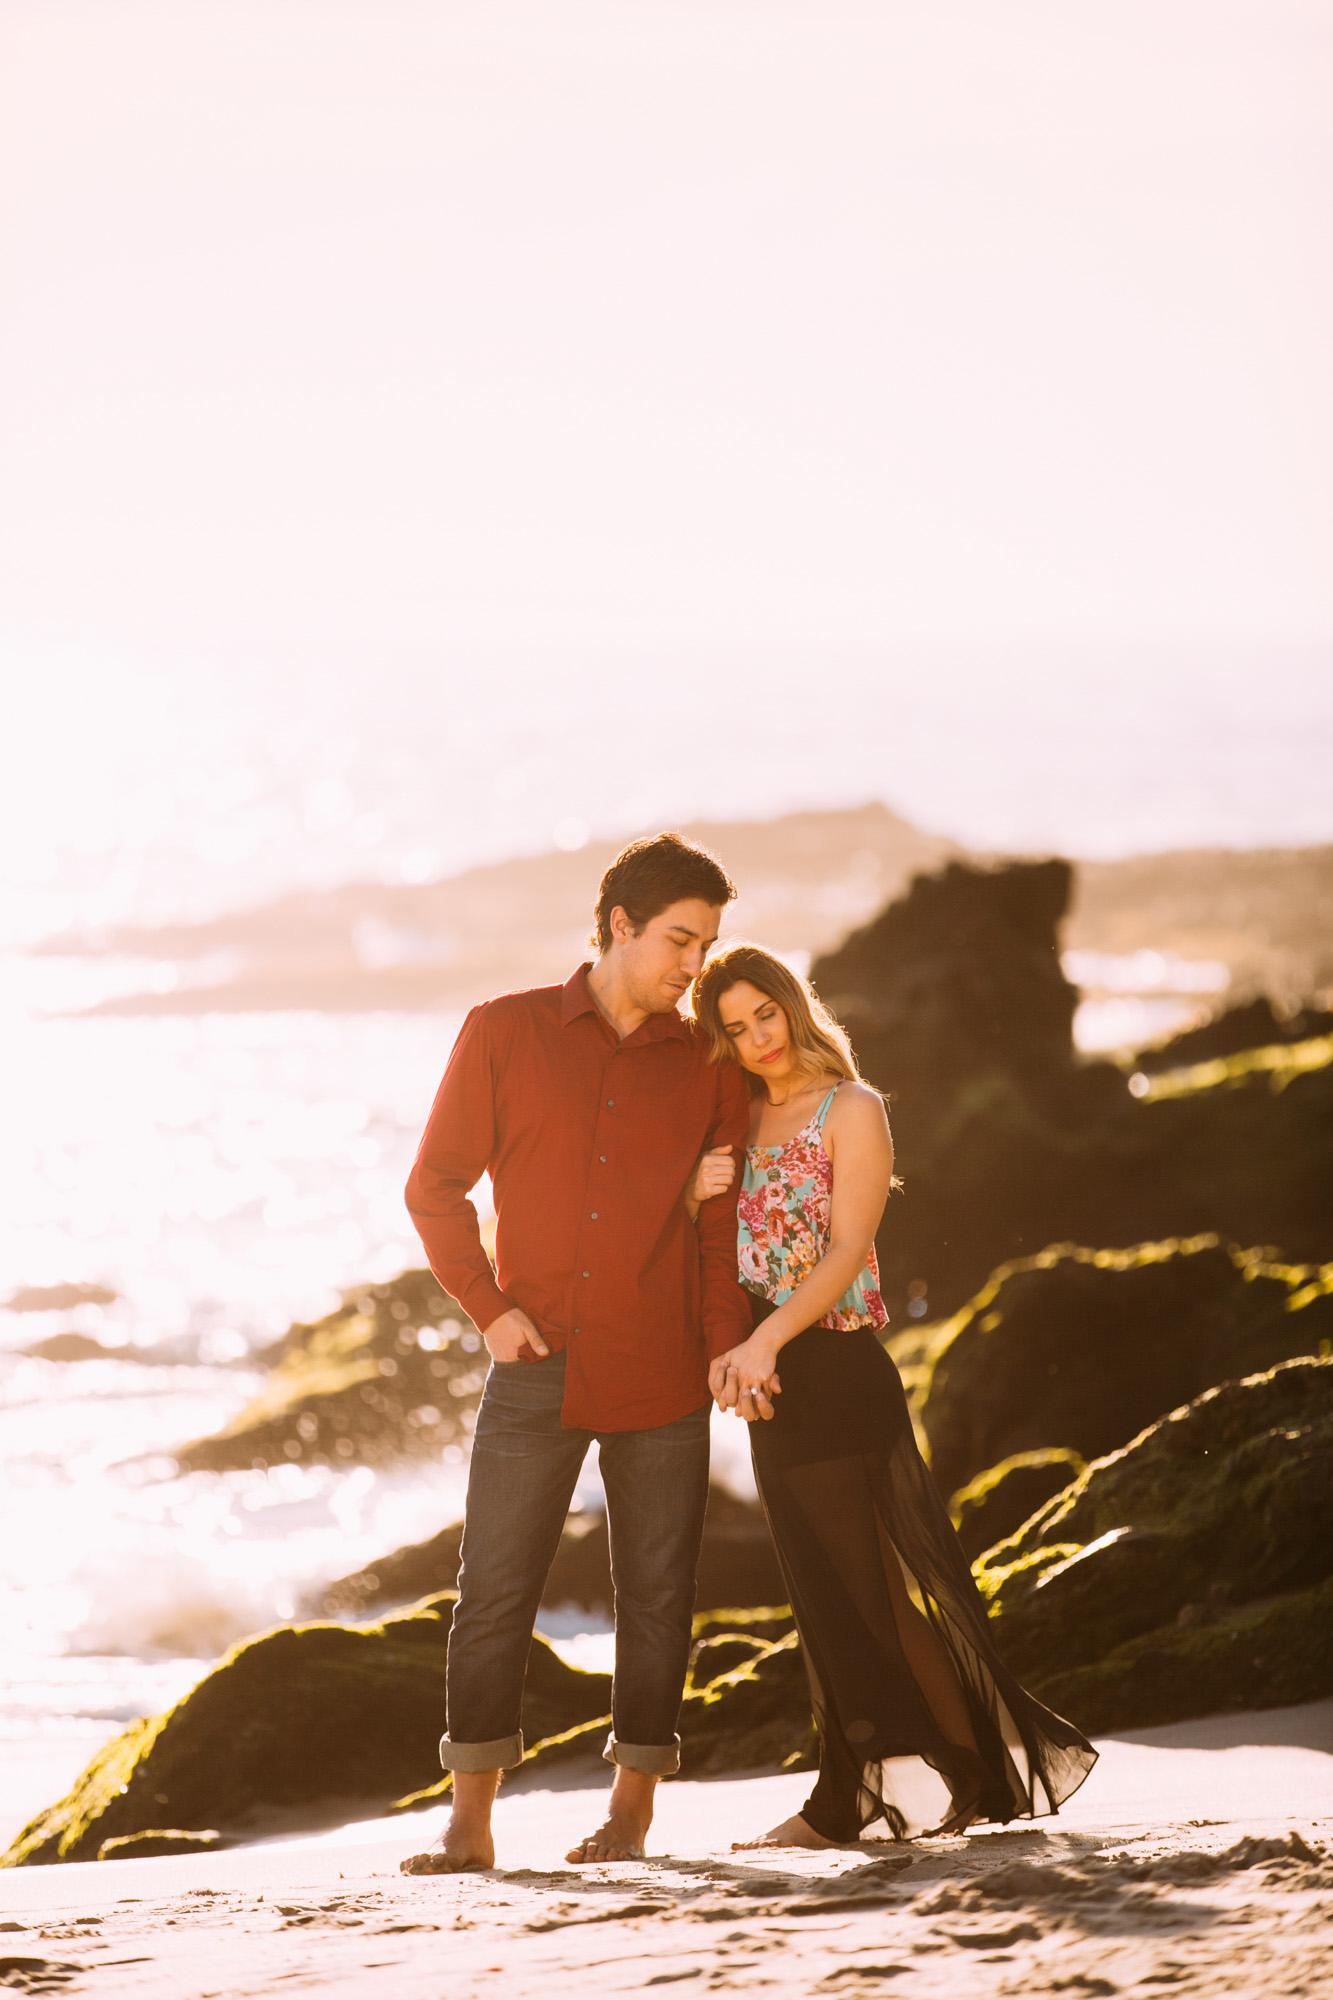 2017.3.2-AD-Orange-County-Engagement_Photography-Sarah-Mack-Photo 10.jpg